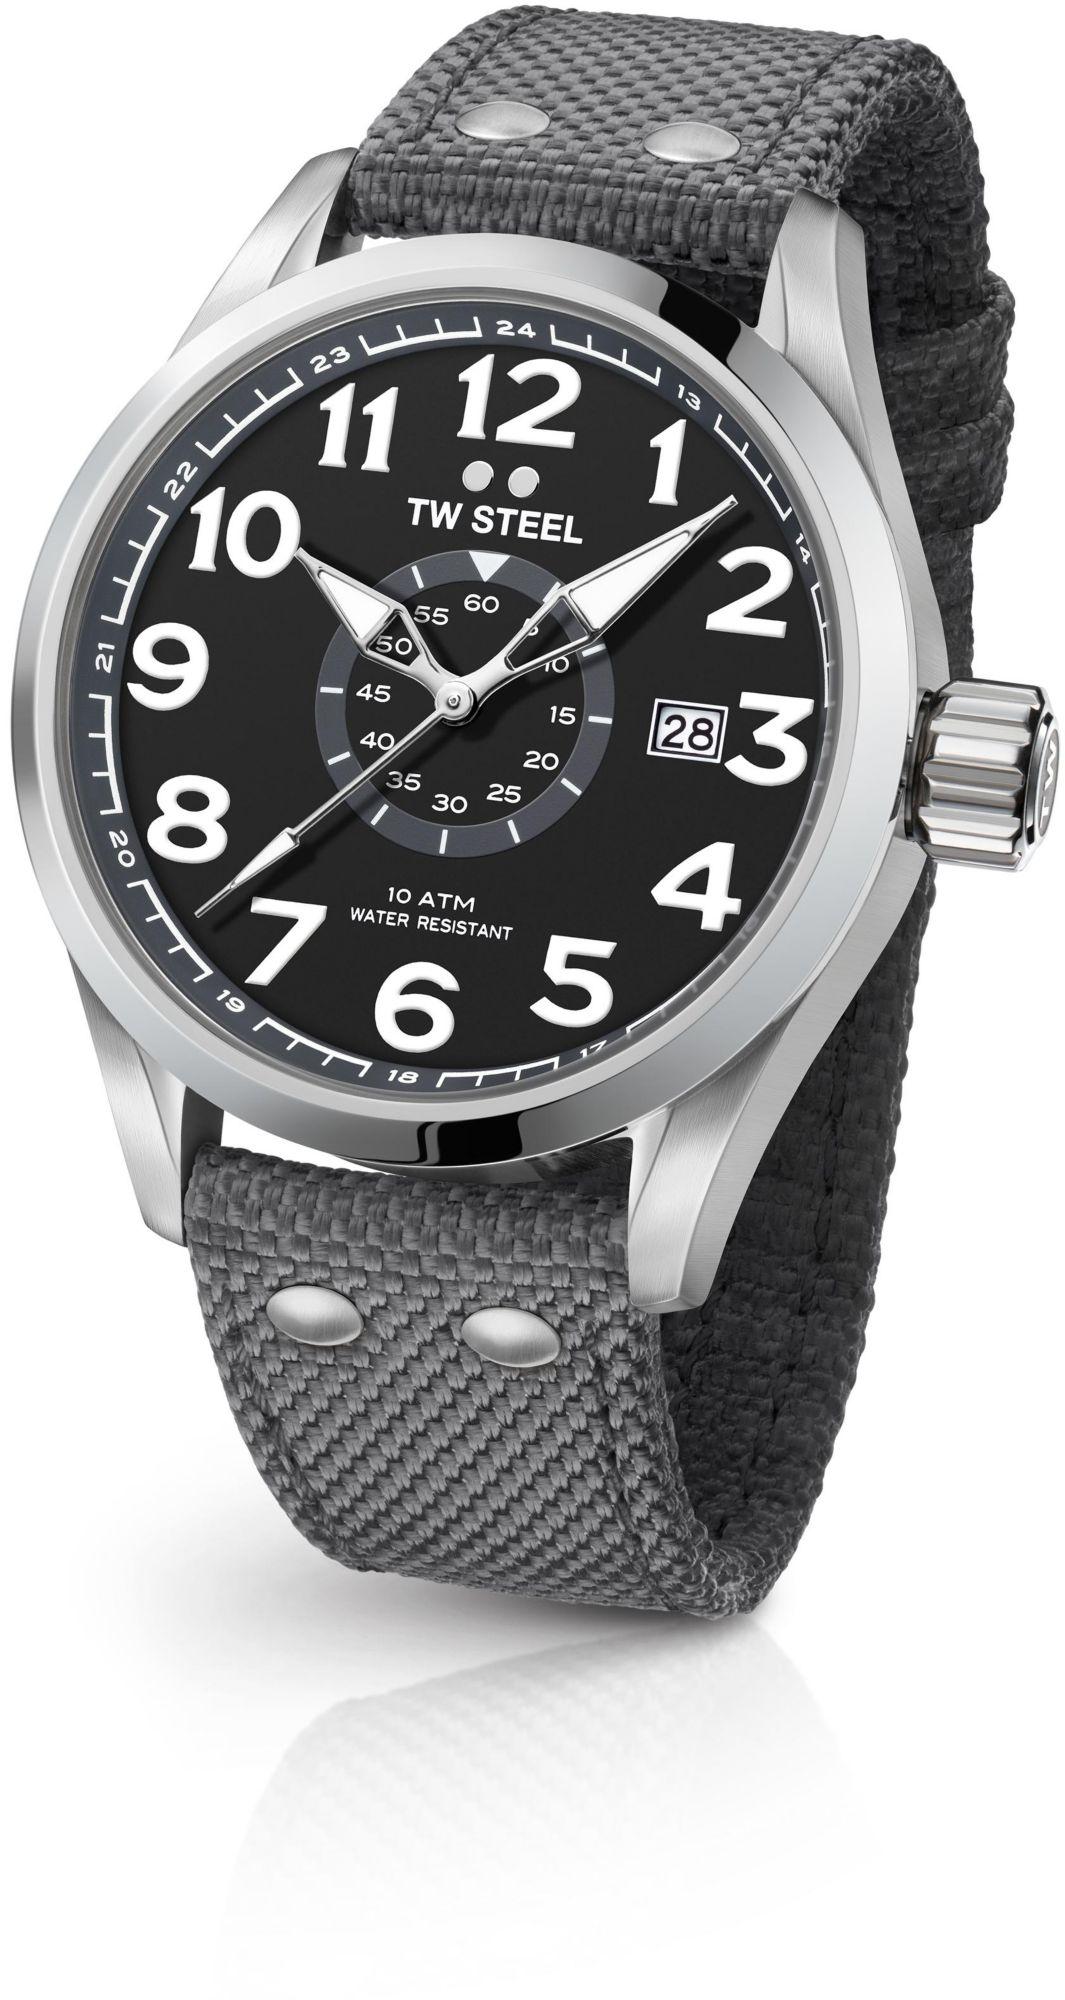 TW STEEL -Uhr TW Steel Grau